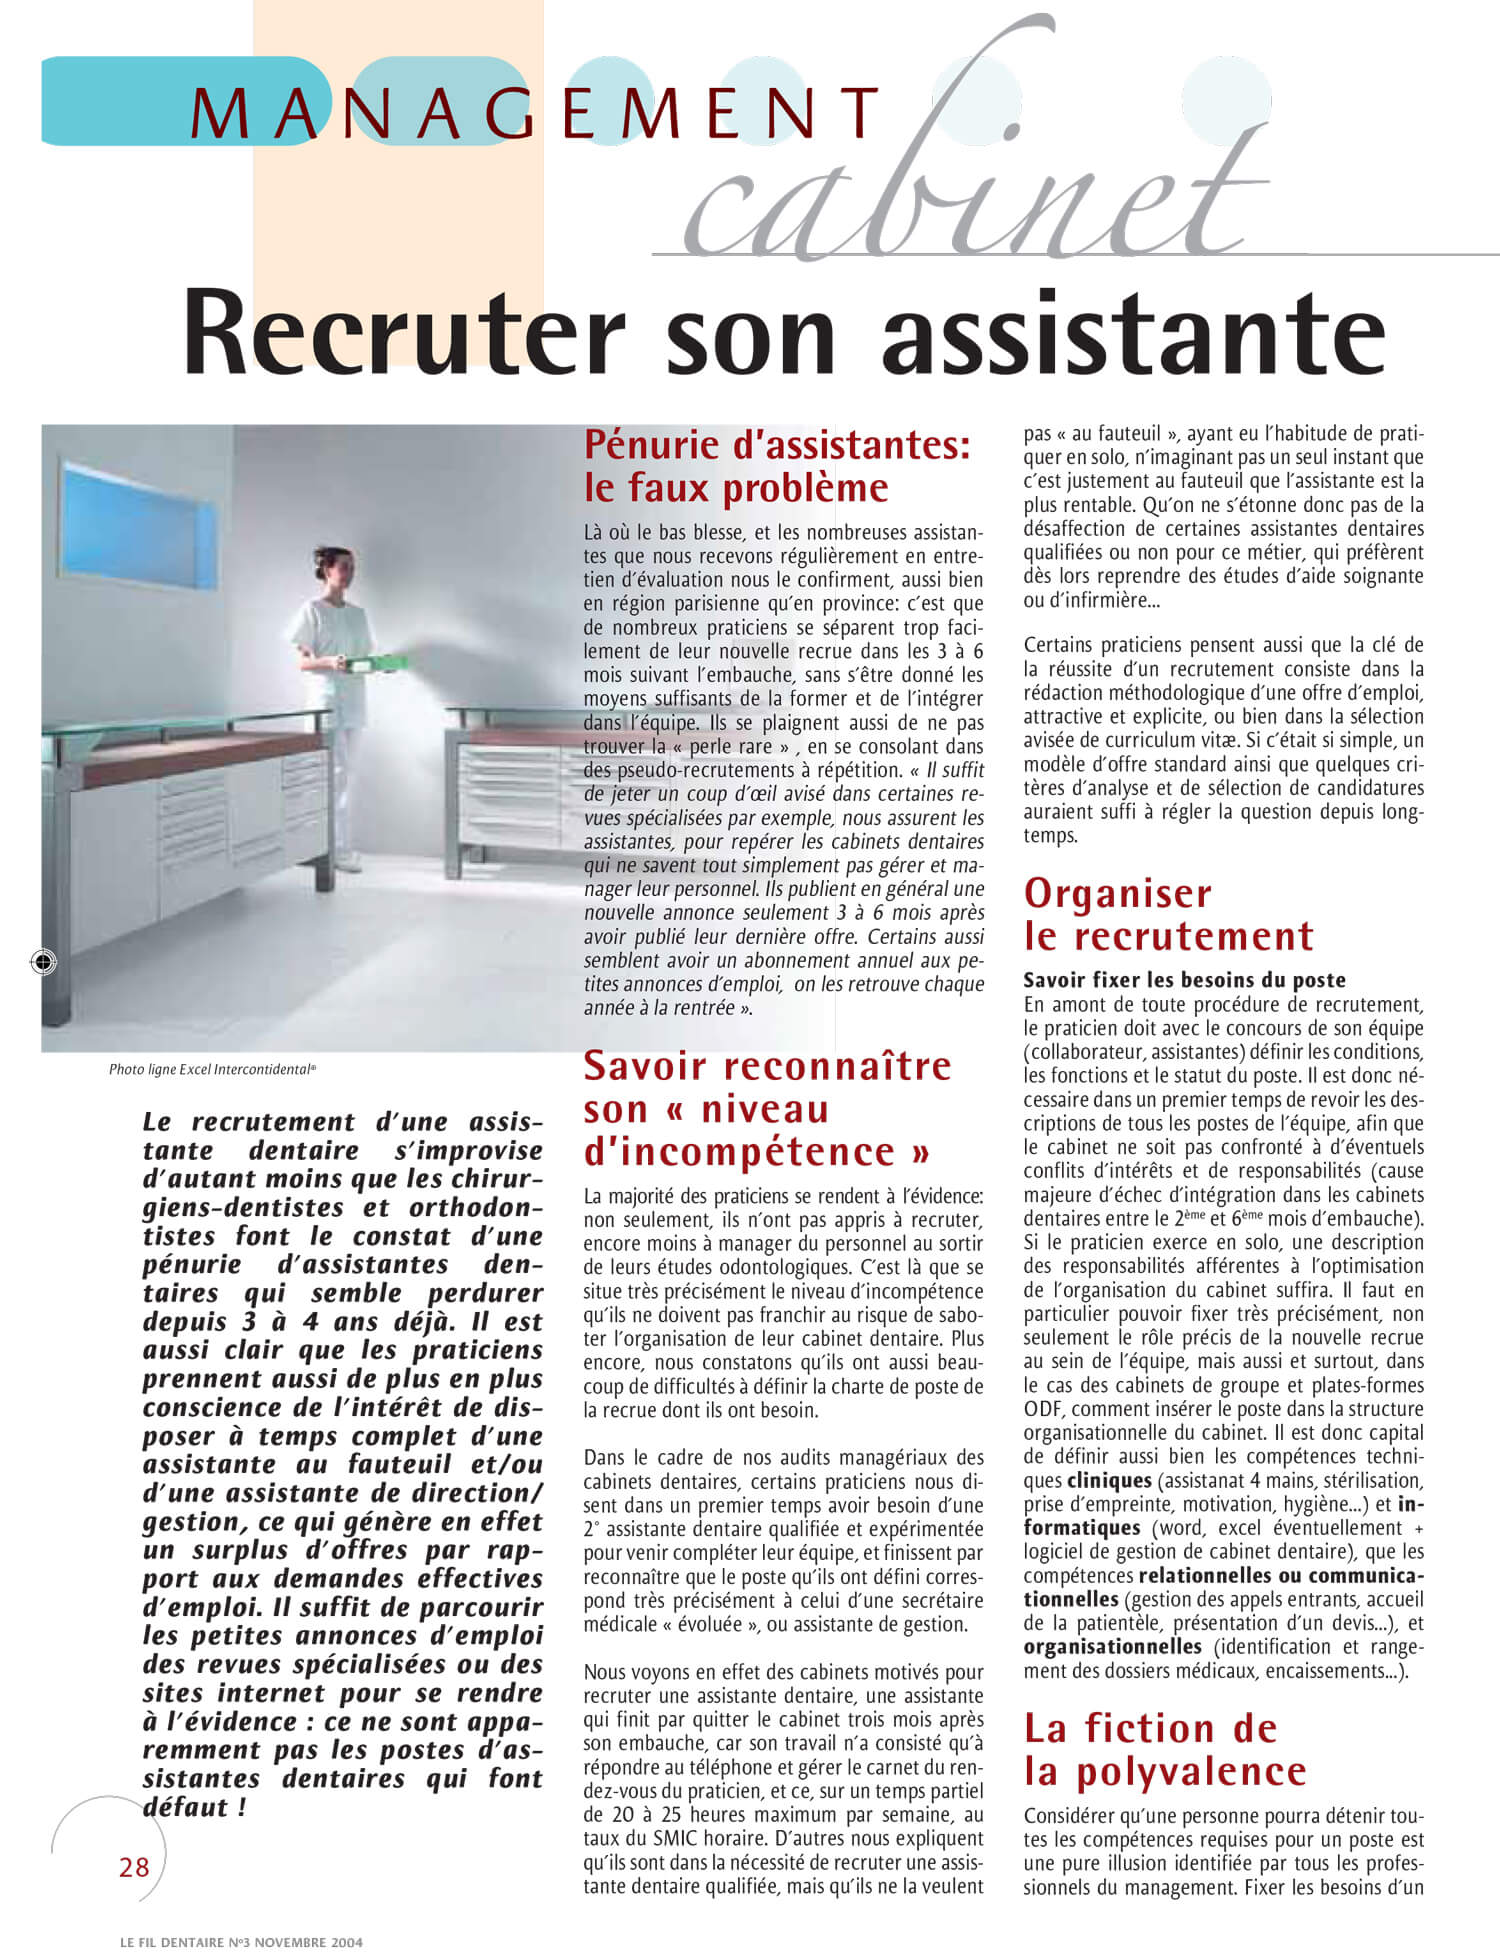 Le_Fil_Dentaire_Recruter_son_assistante_dentaire_Rodolphe_Cochet.jpg